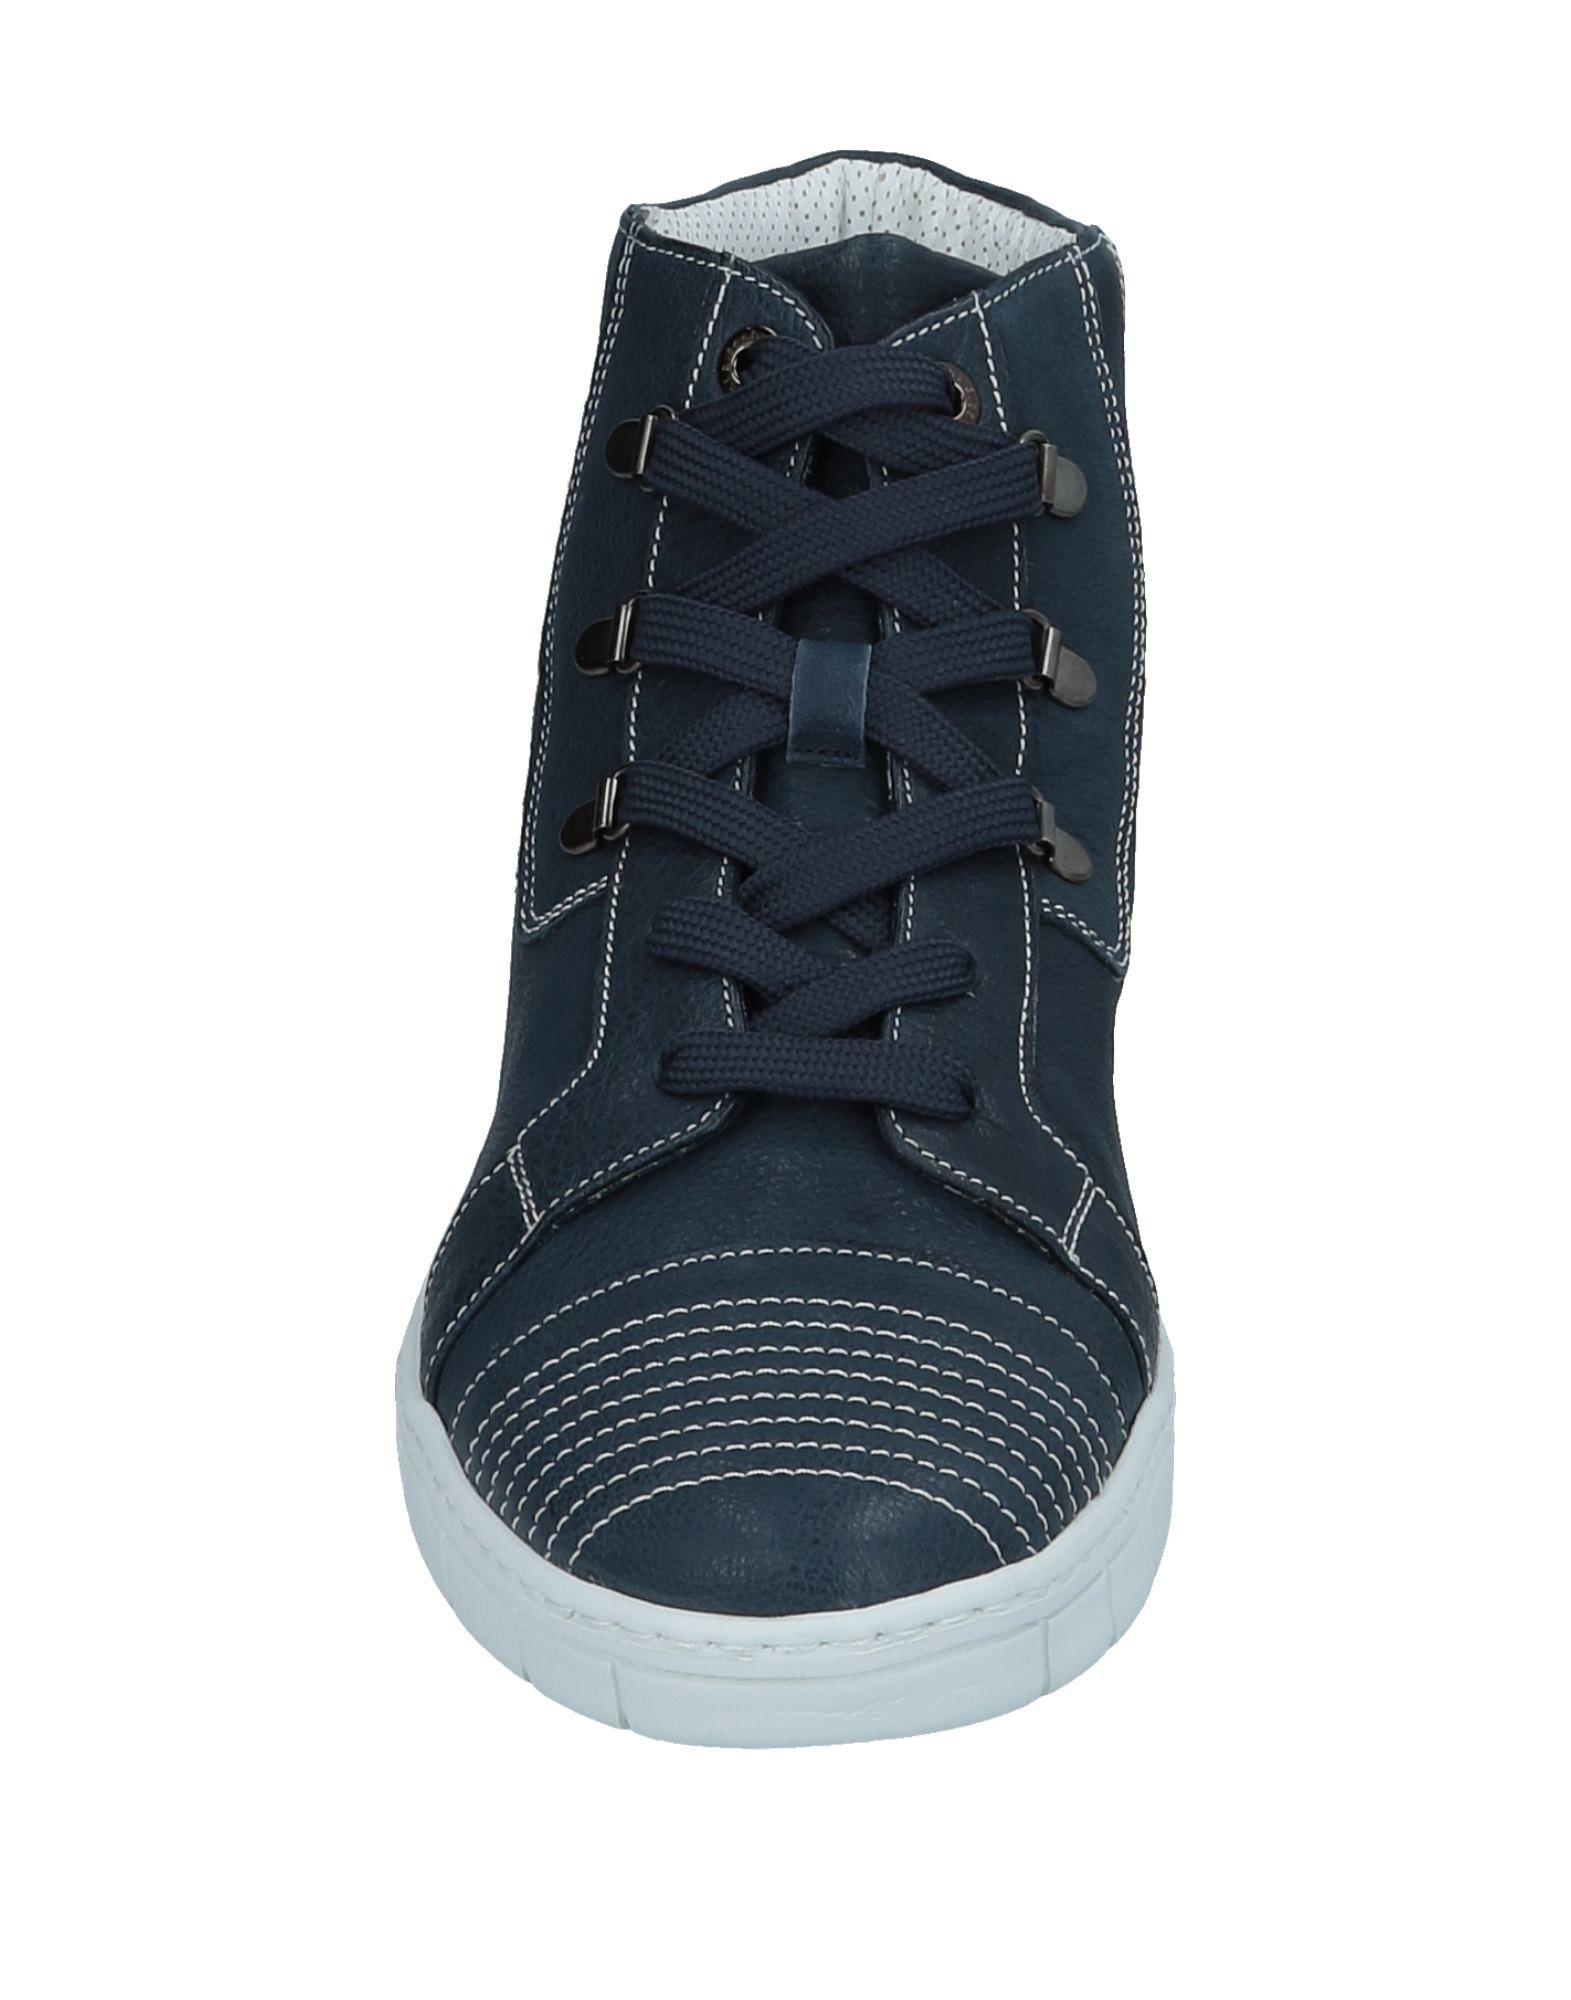 A.Testoni Sneakers Herren  11544014JQ Gute Qualität beliebte beliebte beliebte Schuhe c7dba7